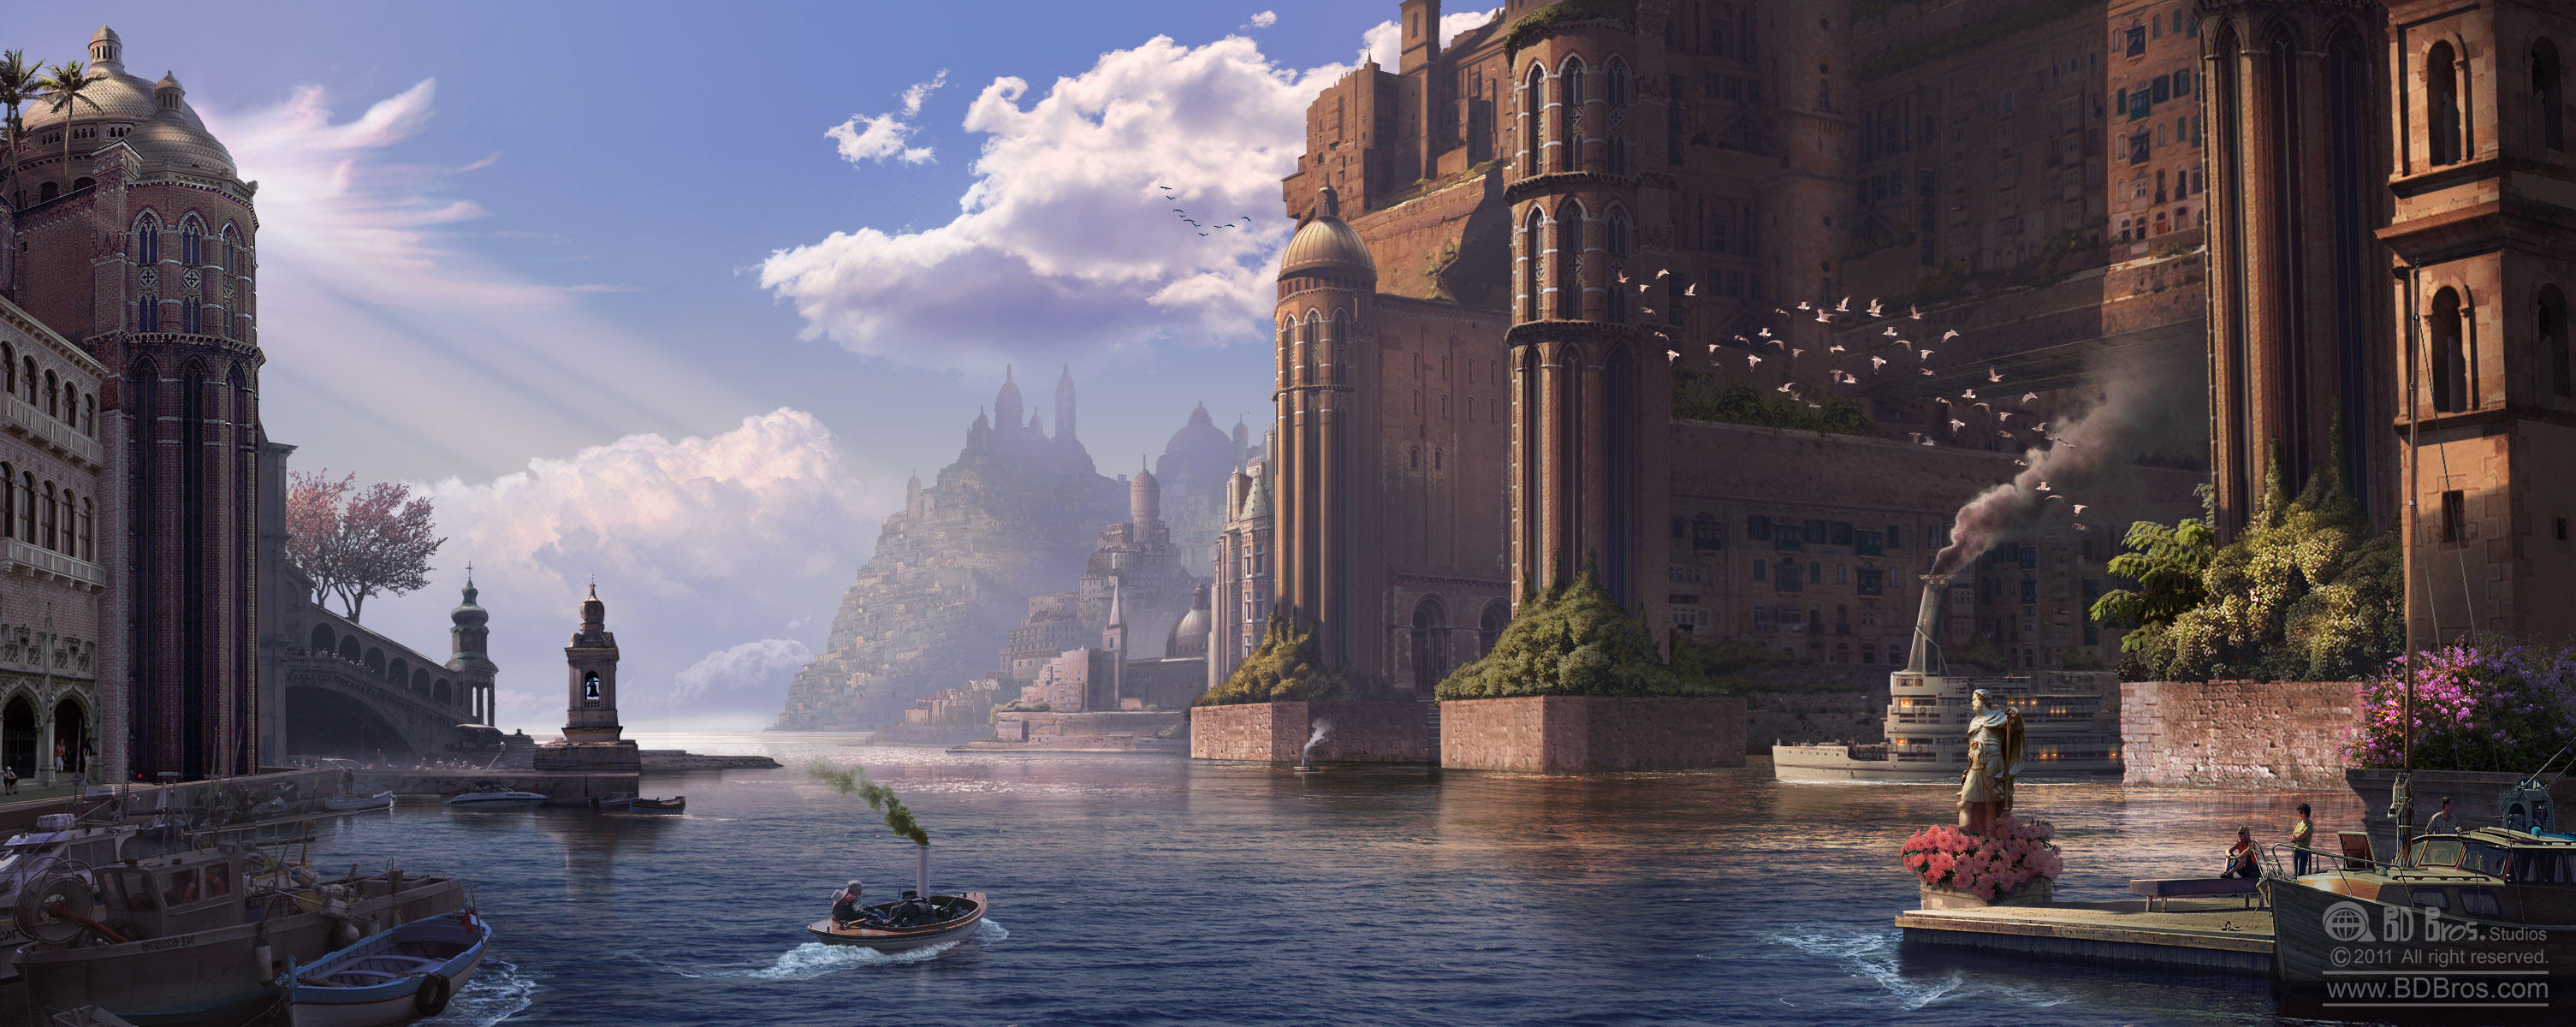 Venetian Dream: Environment Matte Painting by ZOOLAX